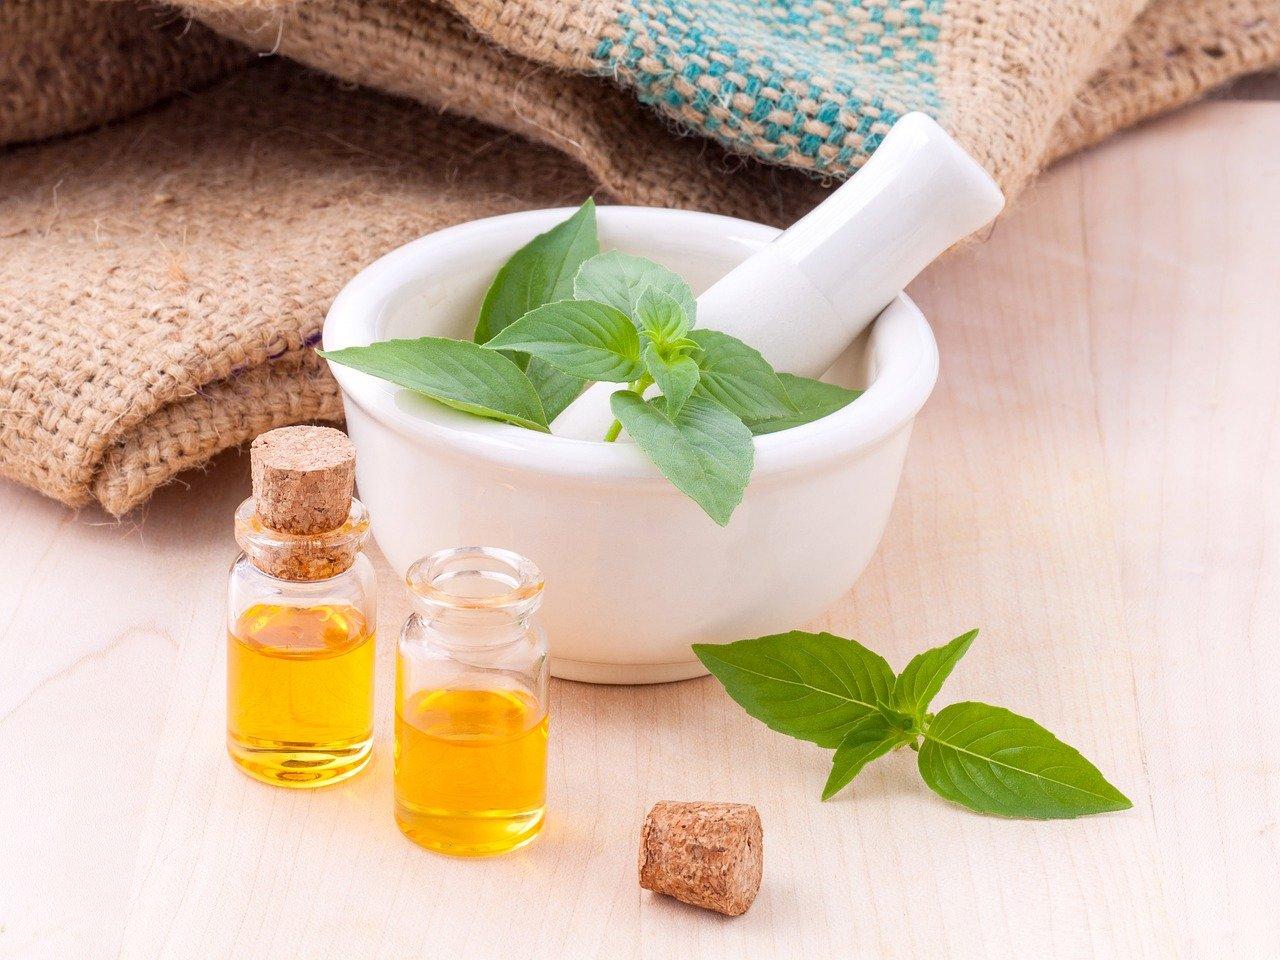 10 Best Essential Oils For Skincare